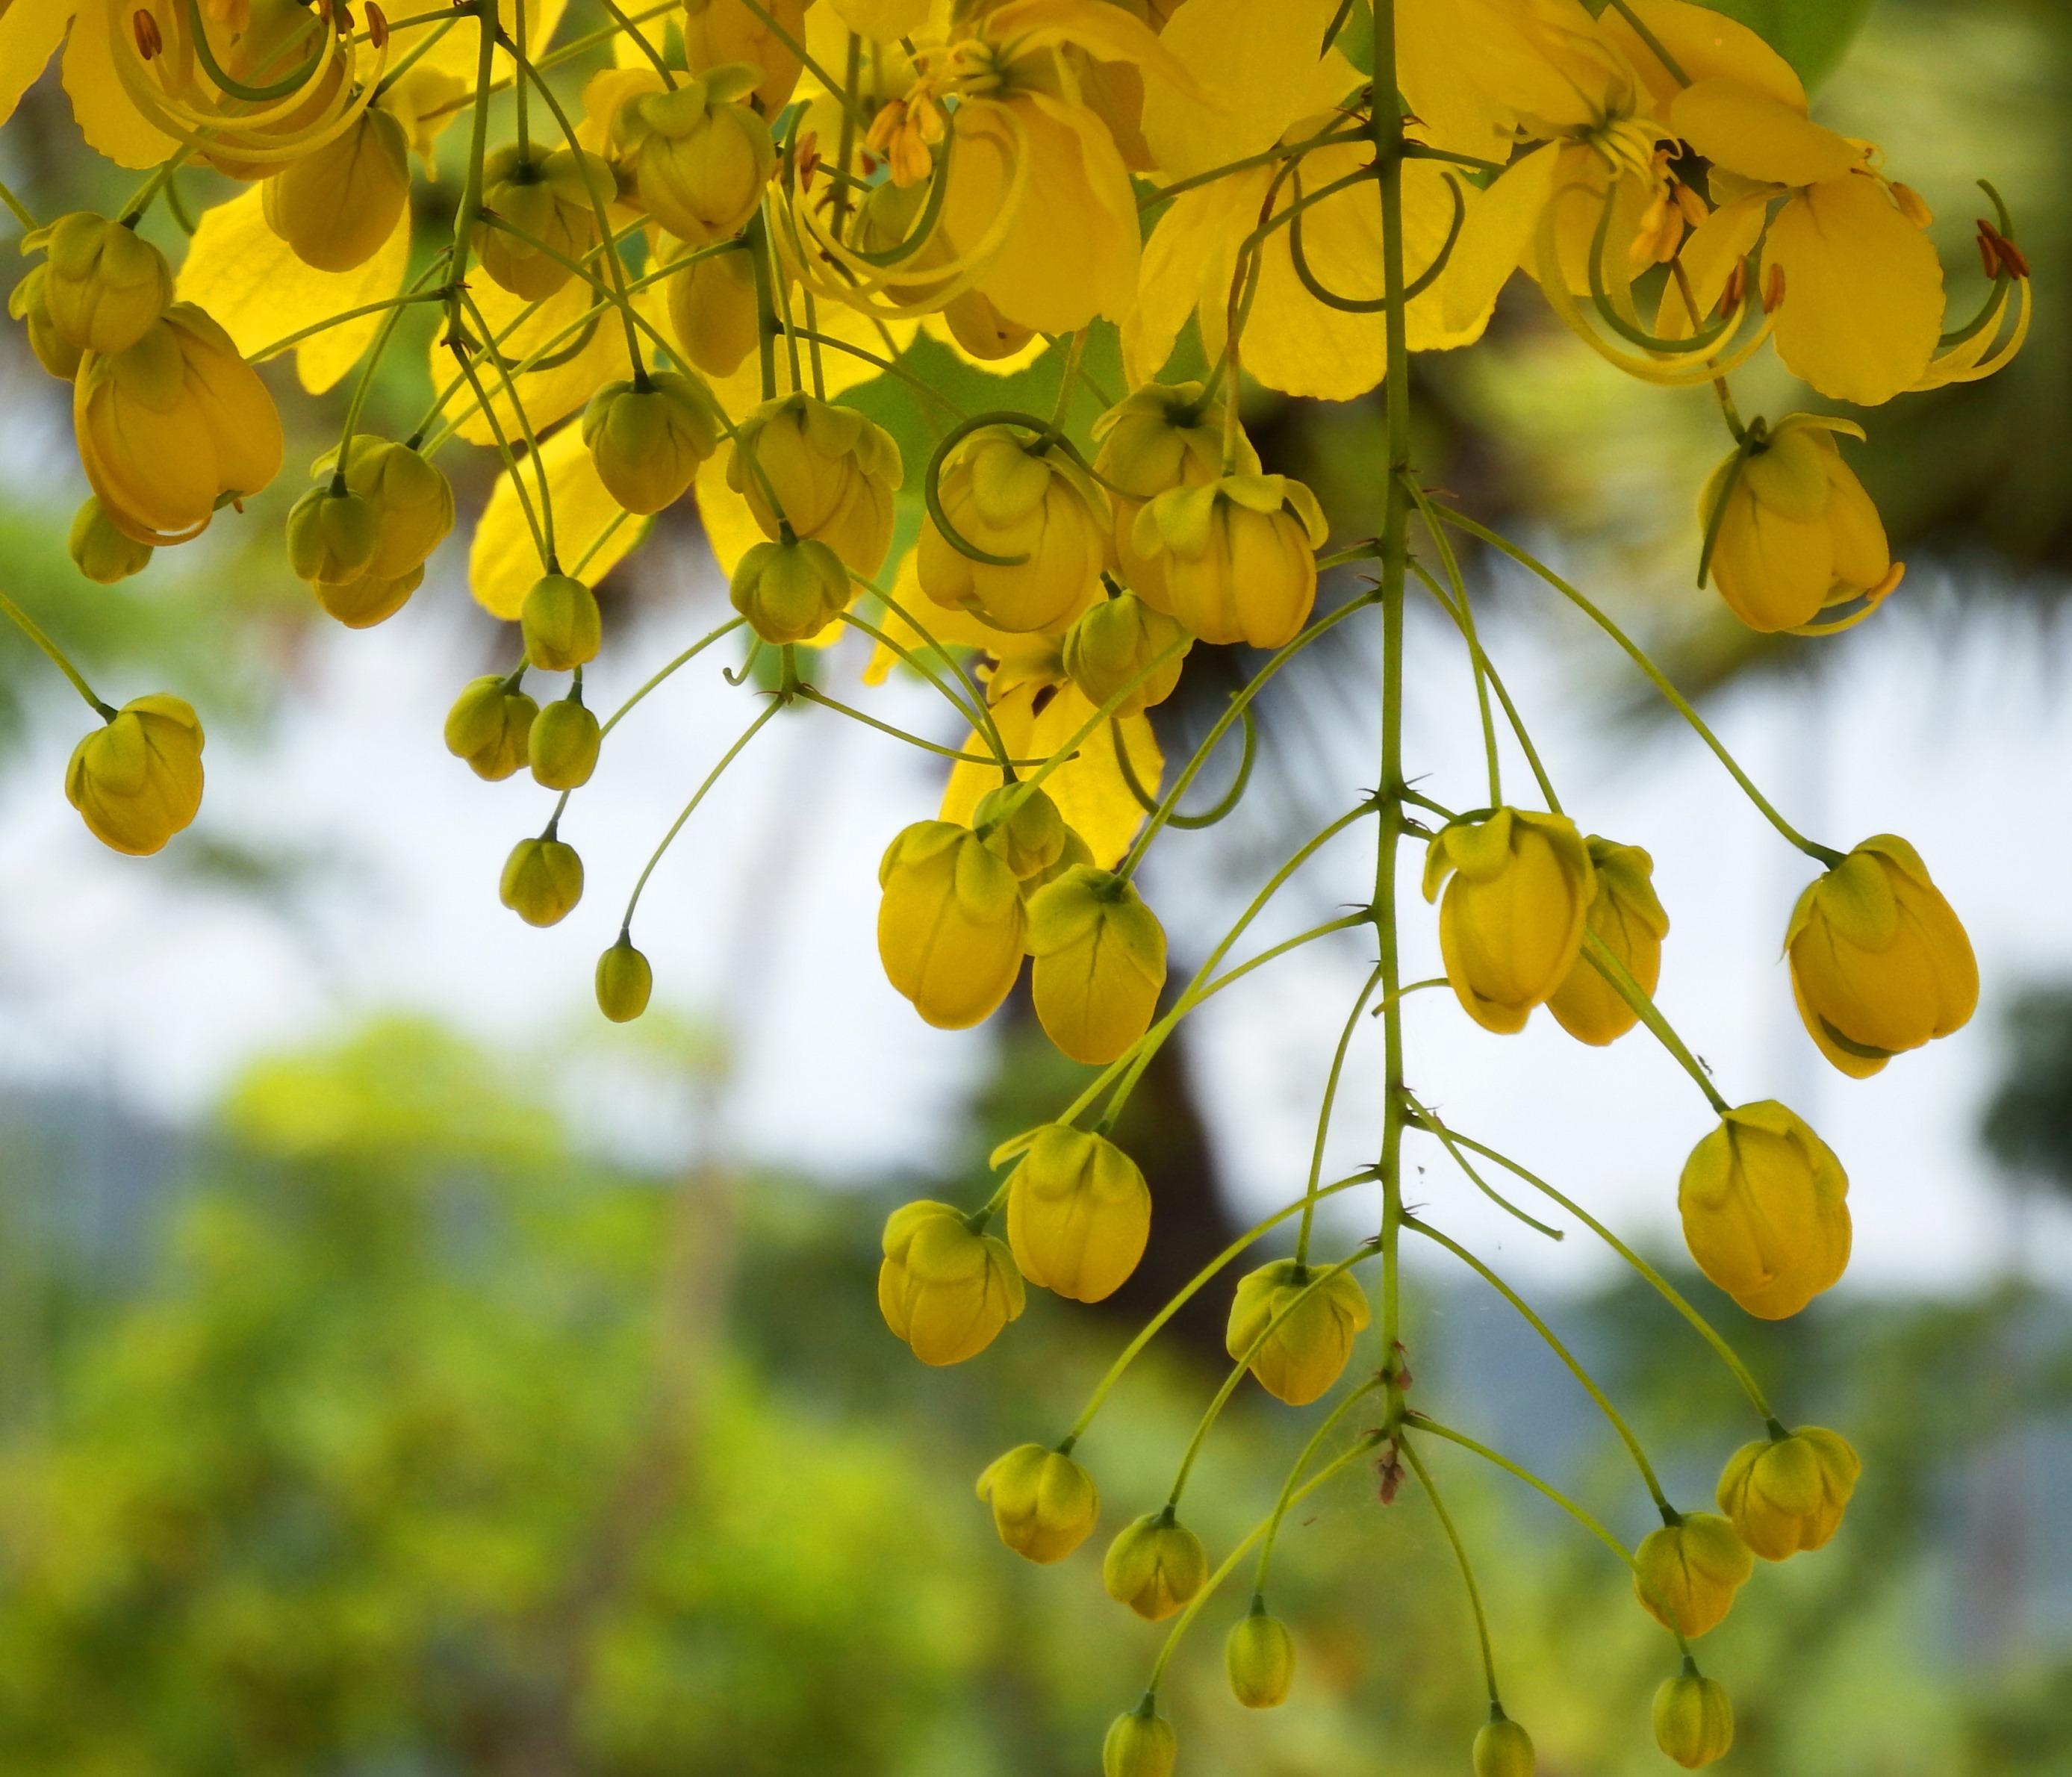 Tropical yellow blossom tree photo